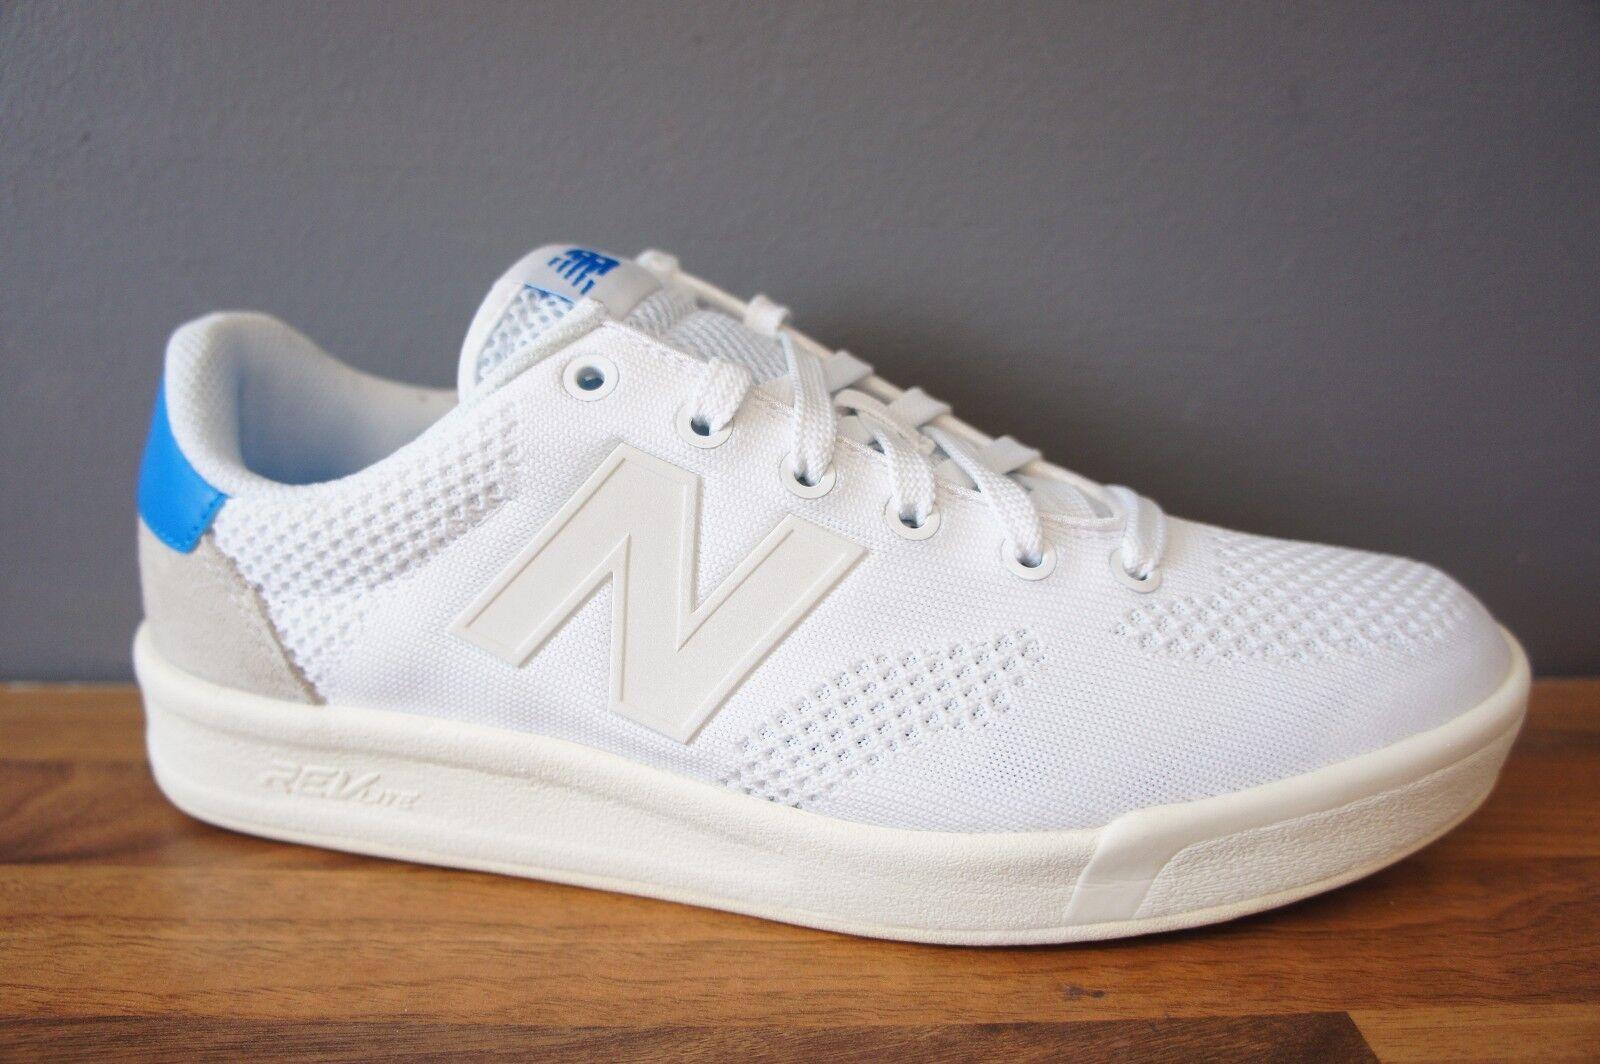 New Balance Mens Size 7.5 UK White bluee Classic Mesh Trainers BNWB BOXED NEW